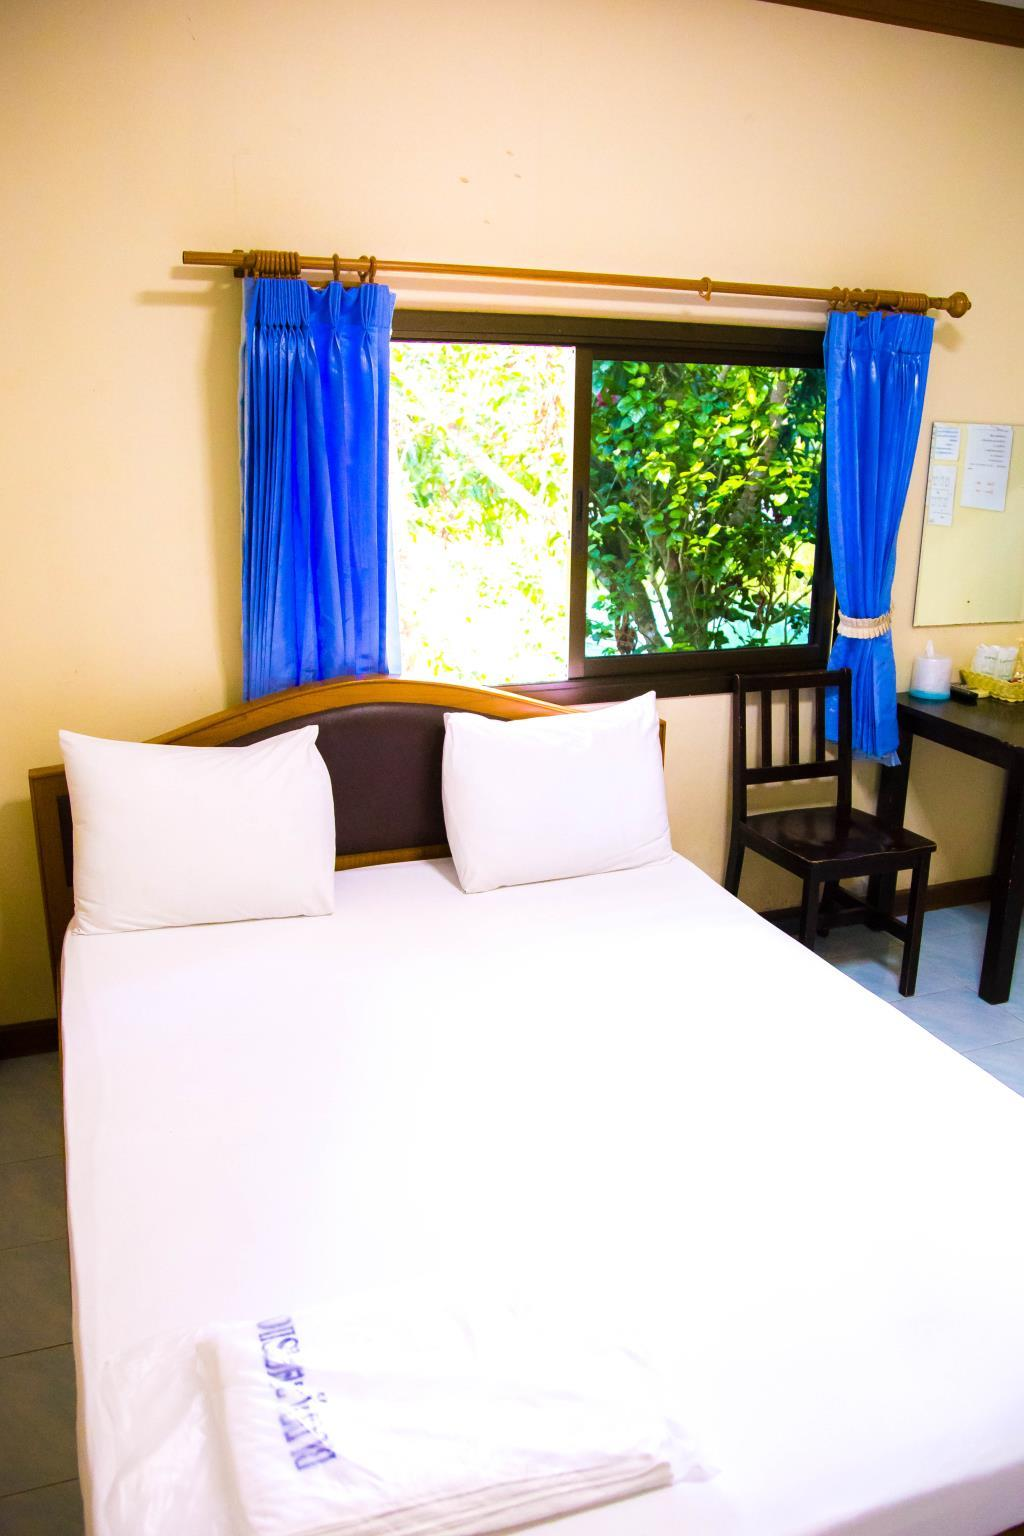 TAWANCHAY HOTEL PHATTHALUNG,โรงแรมธวัชชัย พัทลุง